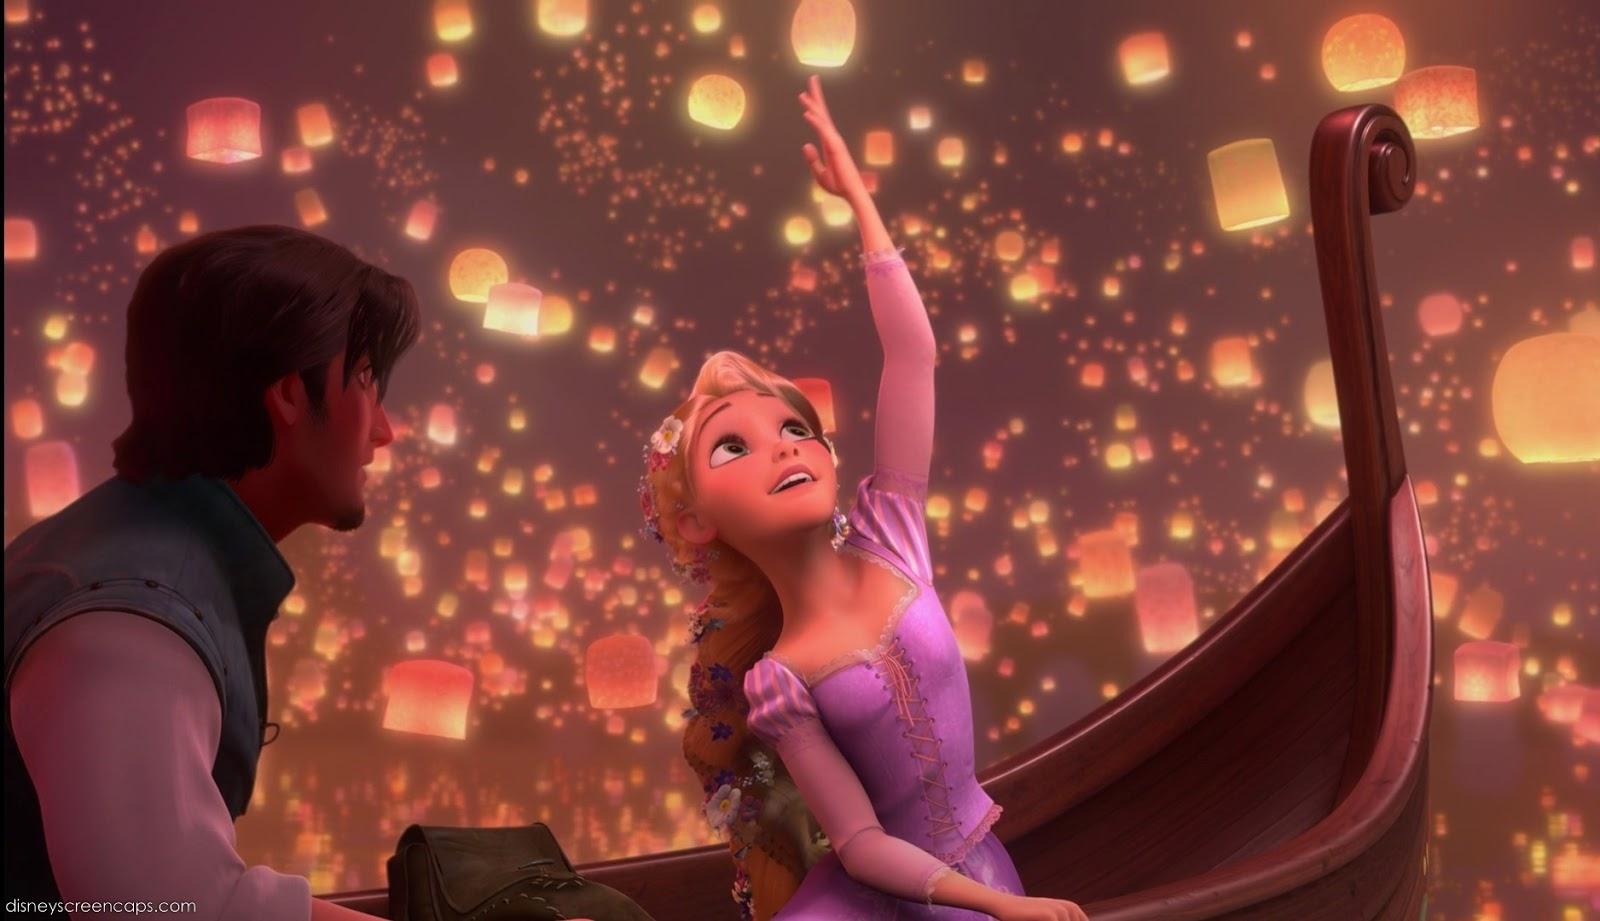 Disney Tangled Rapunzel And Eugene Wallpapers Kids